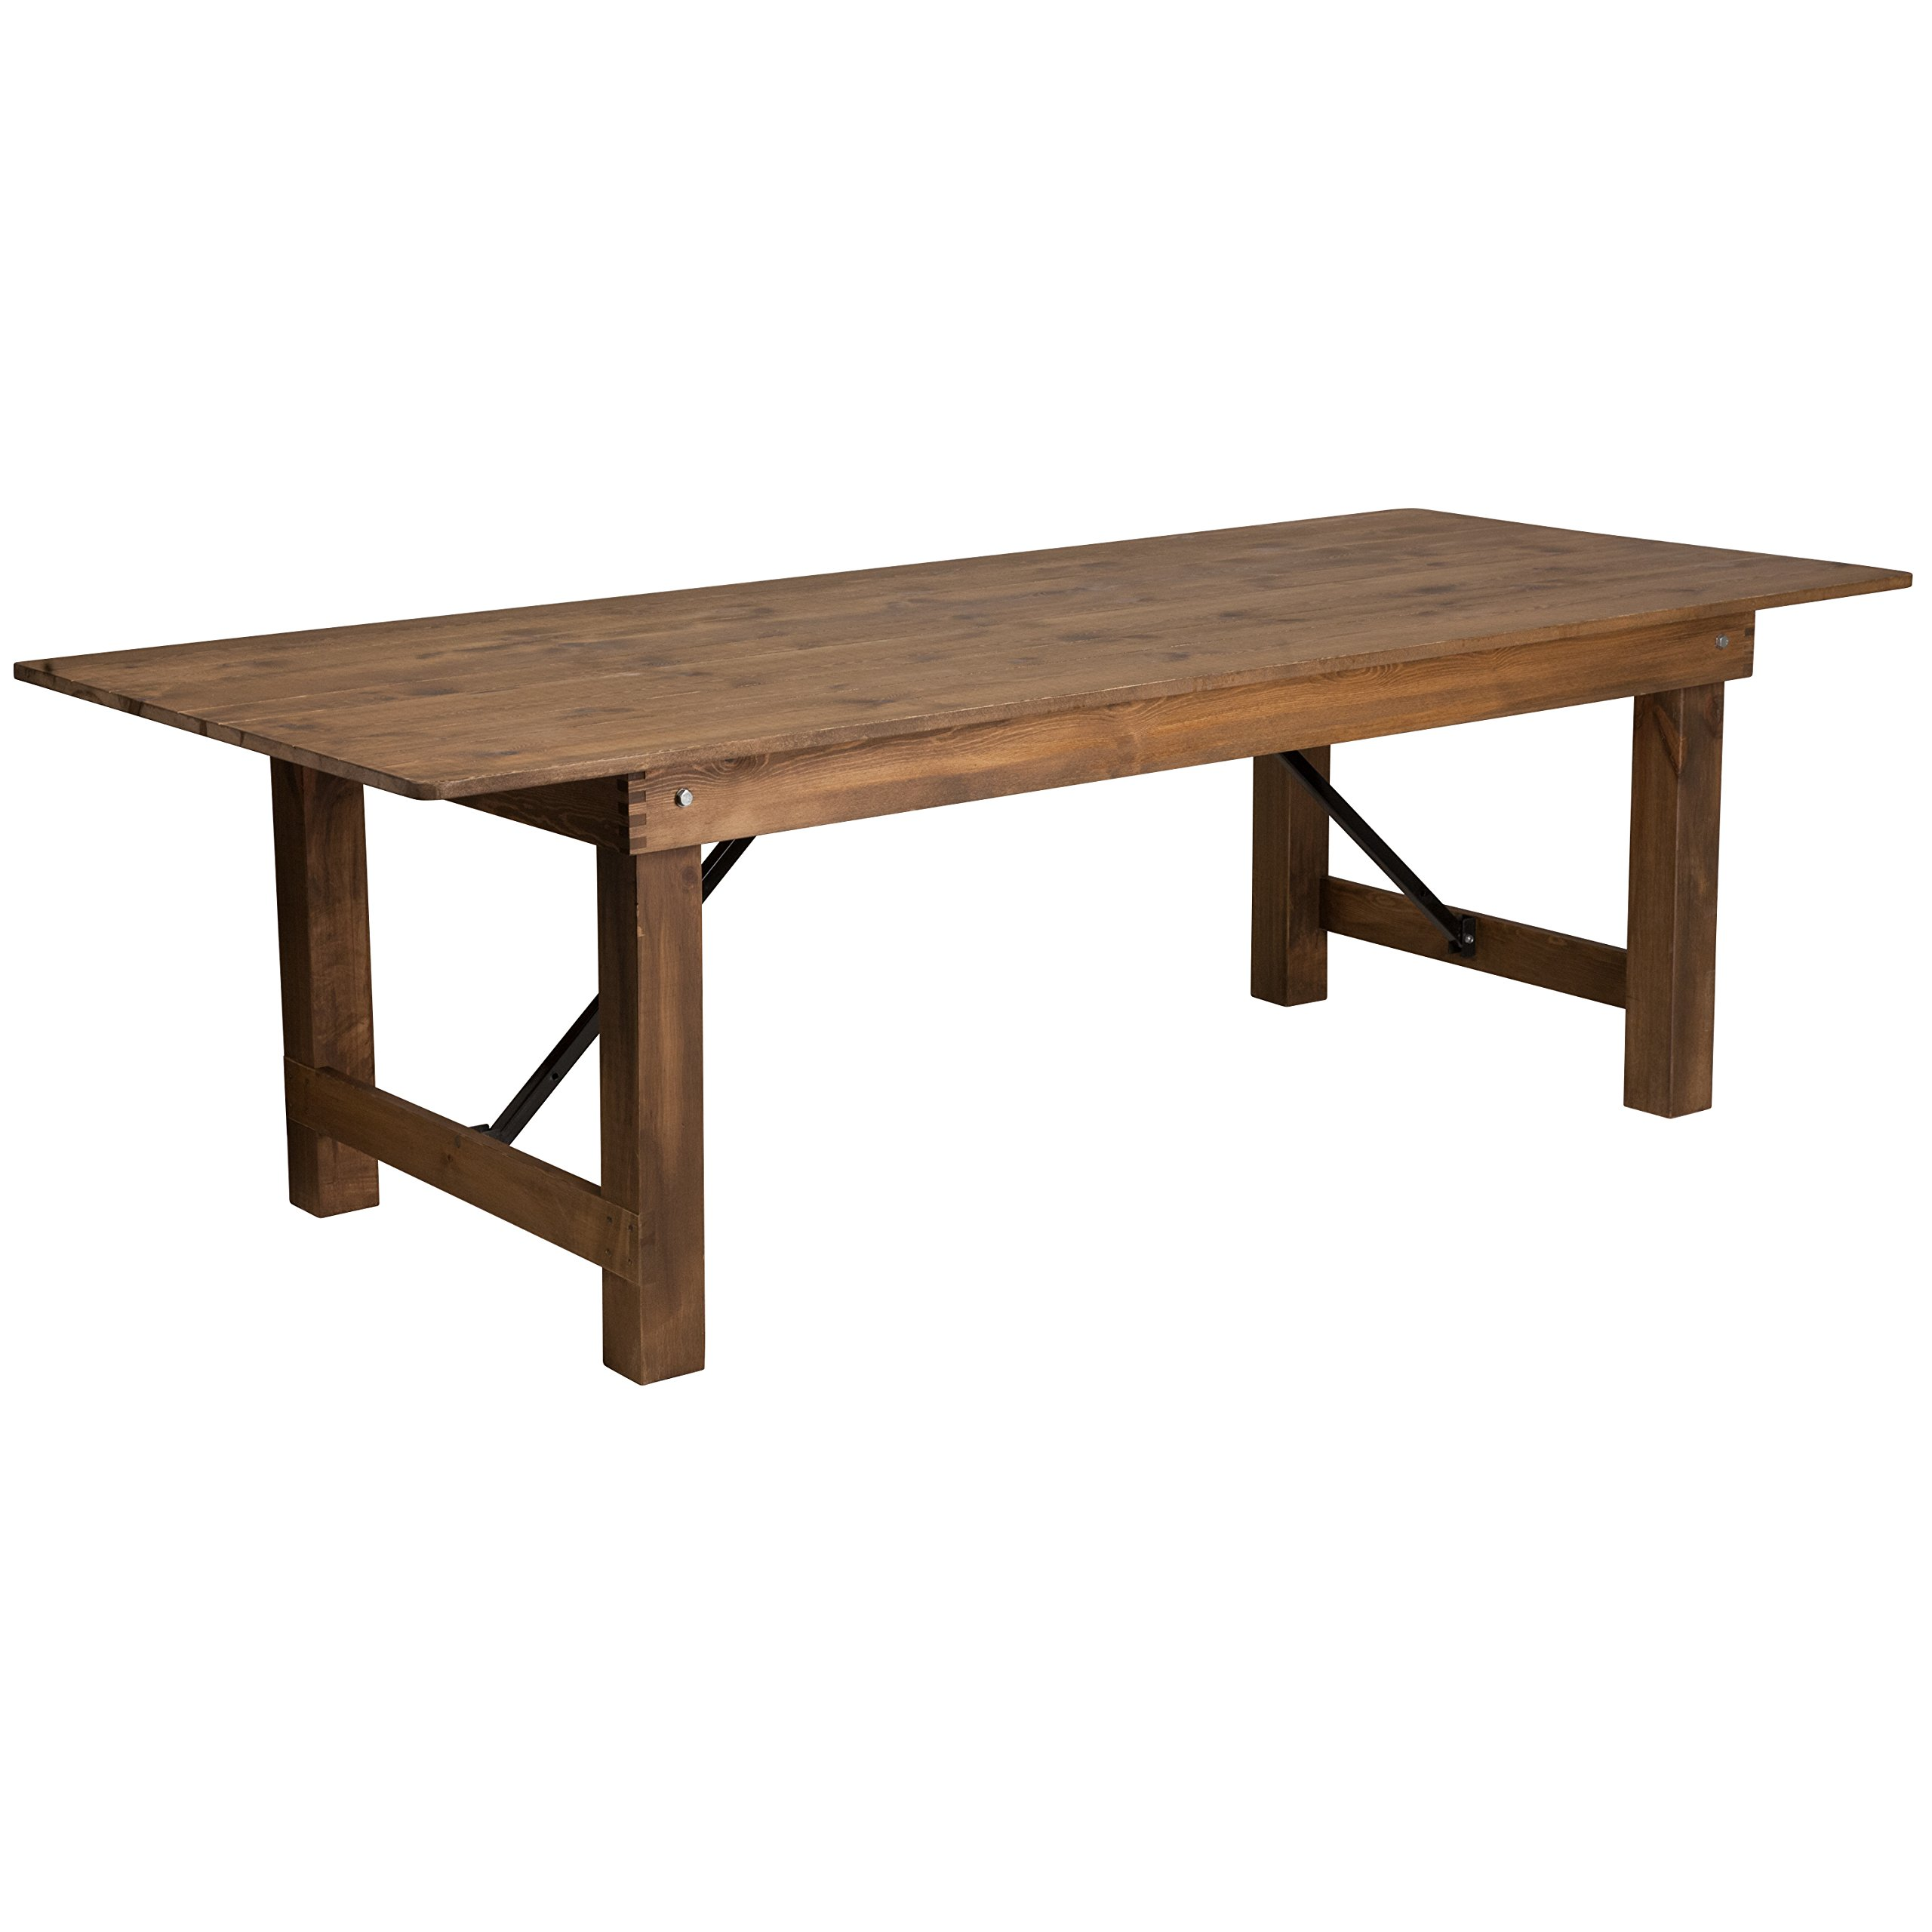 Flash Furniture HERCULES Series 8' x 40'' Antique Rustic Solid Pine Folding Farm Table